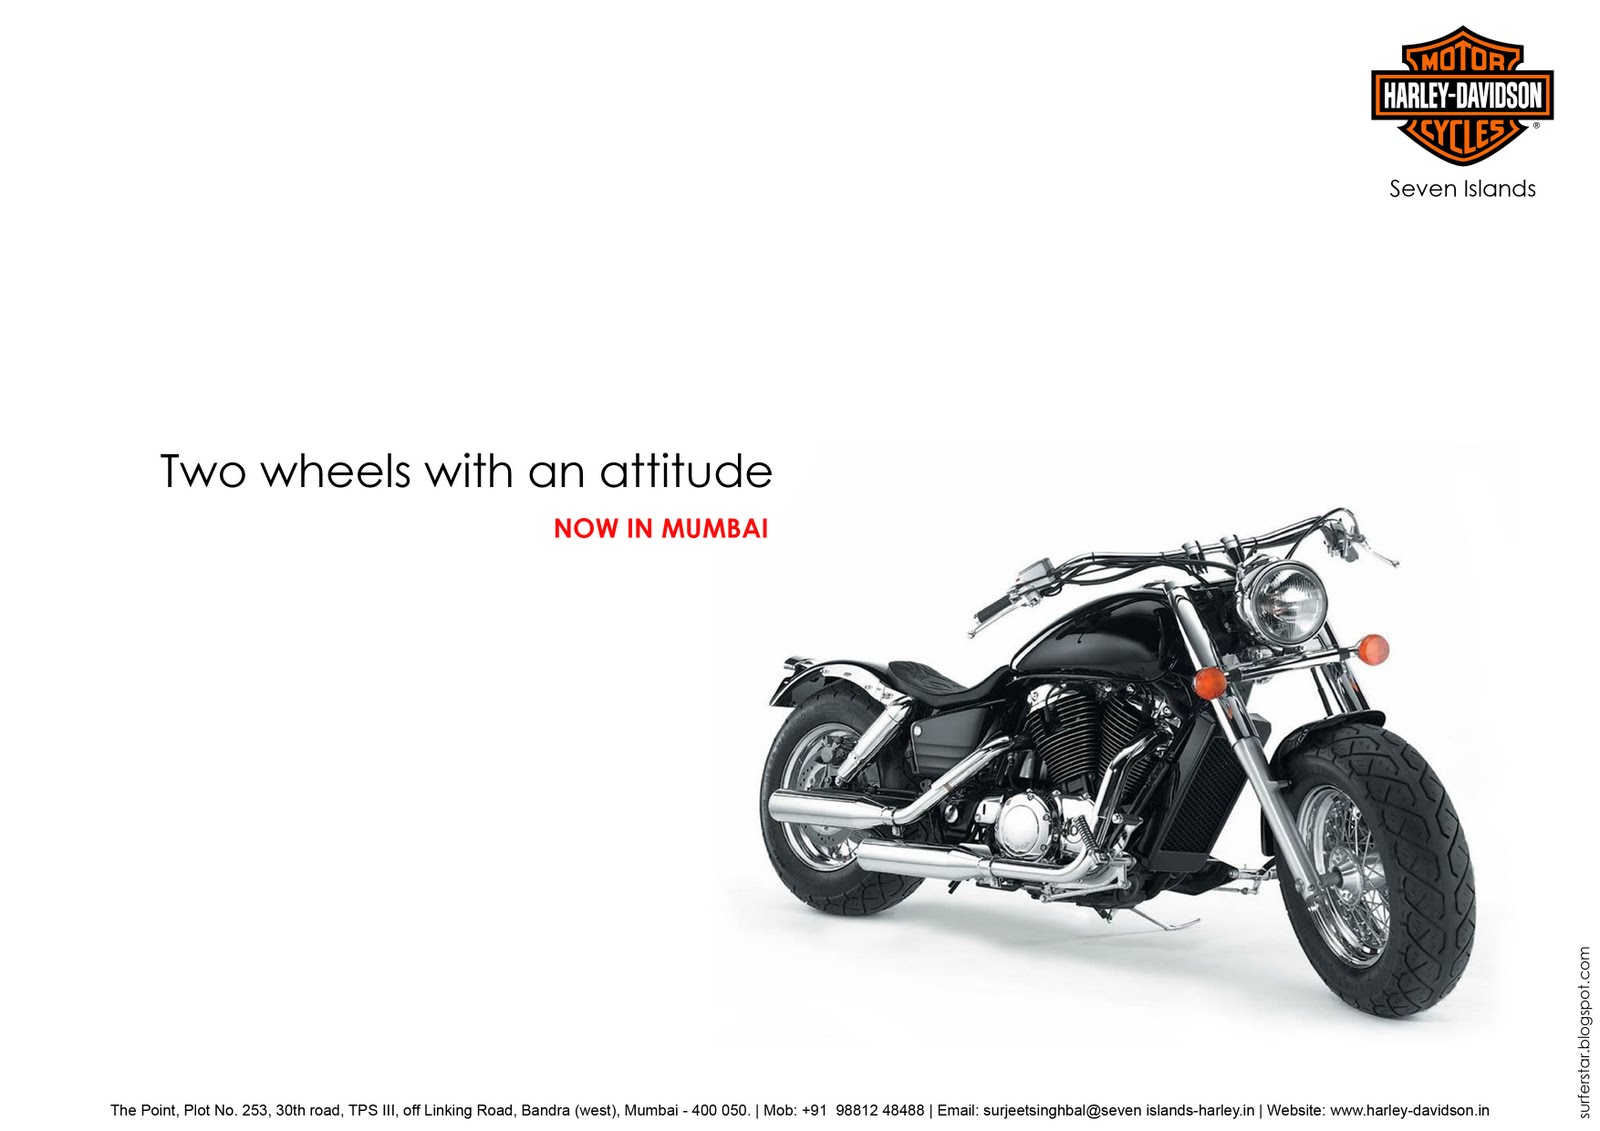 Harley Davidson Advertising: Surfer Of The Stars: Harley Davidson Print Ads